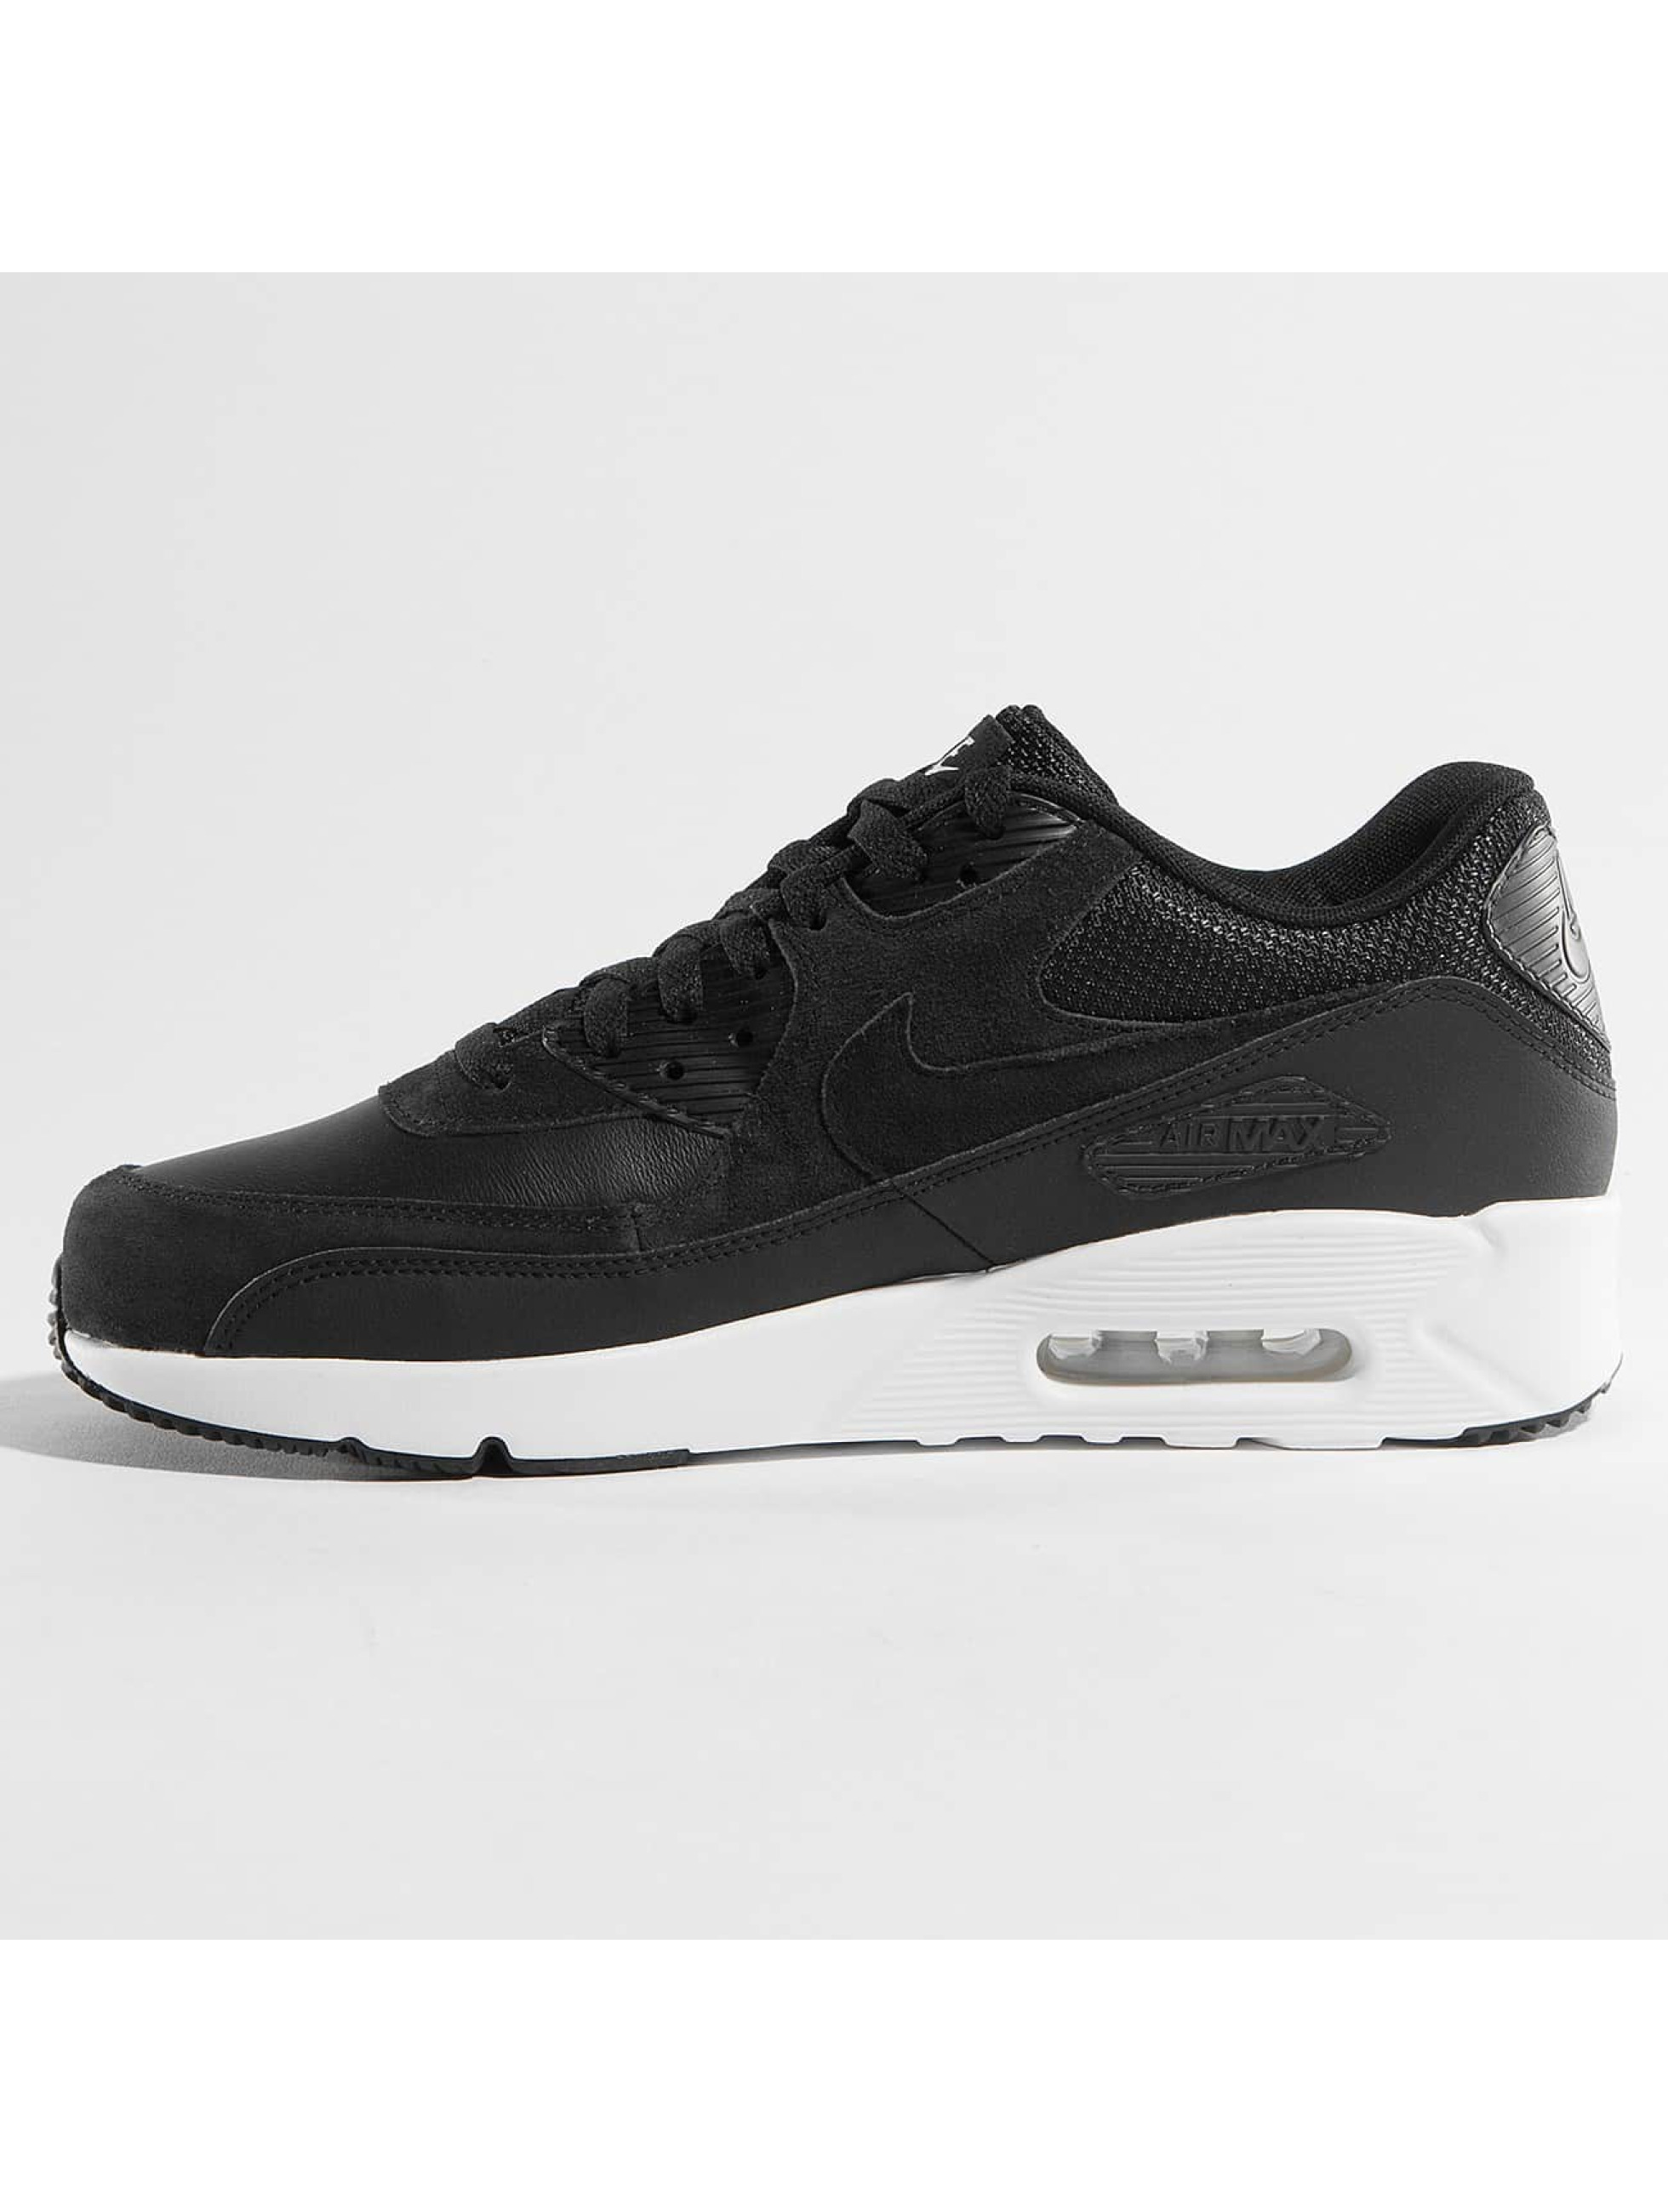 Nike Sneakers Air Max 90 Ultra 2.0 LTR black